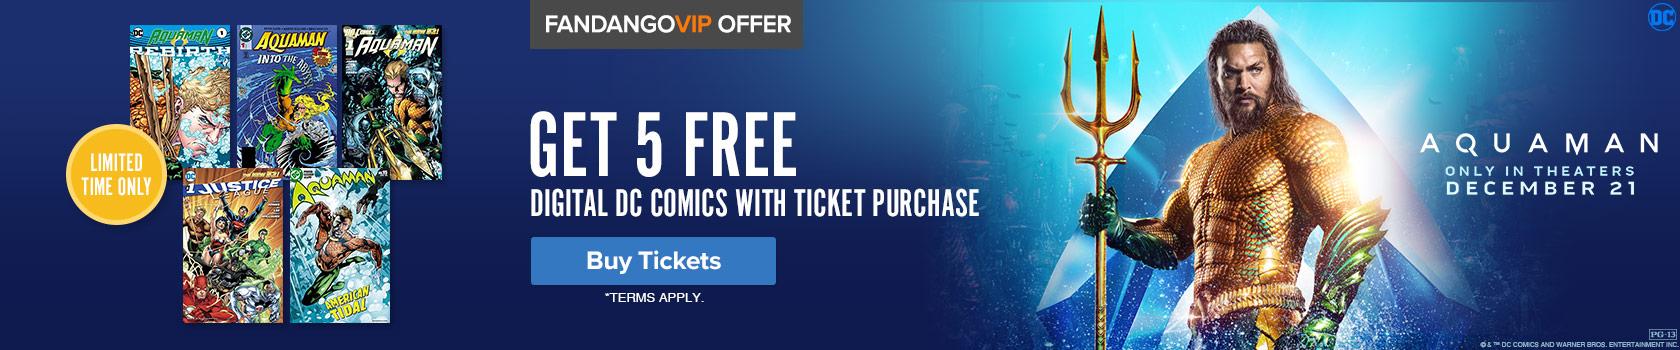 1680 x 350 Fandango - Aquaman GWP: Get 5 free digital DC comics with ticket purchase